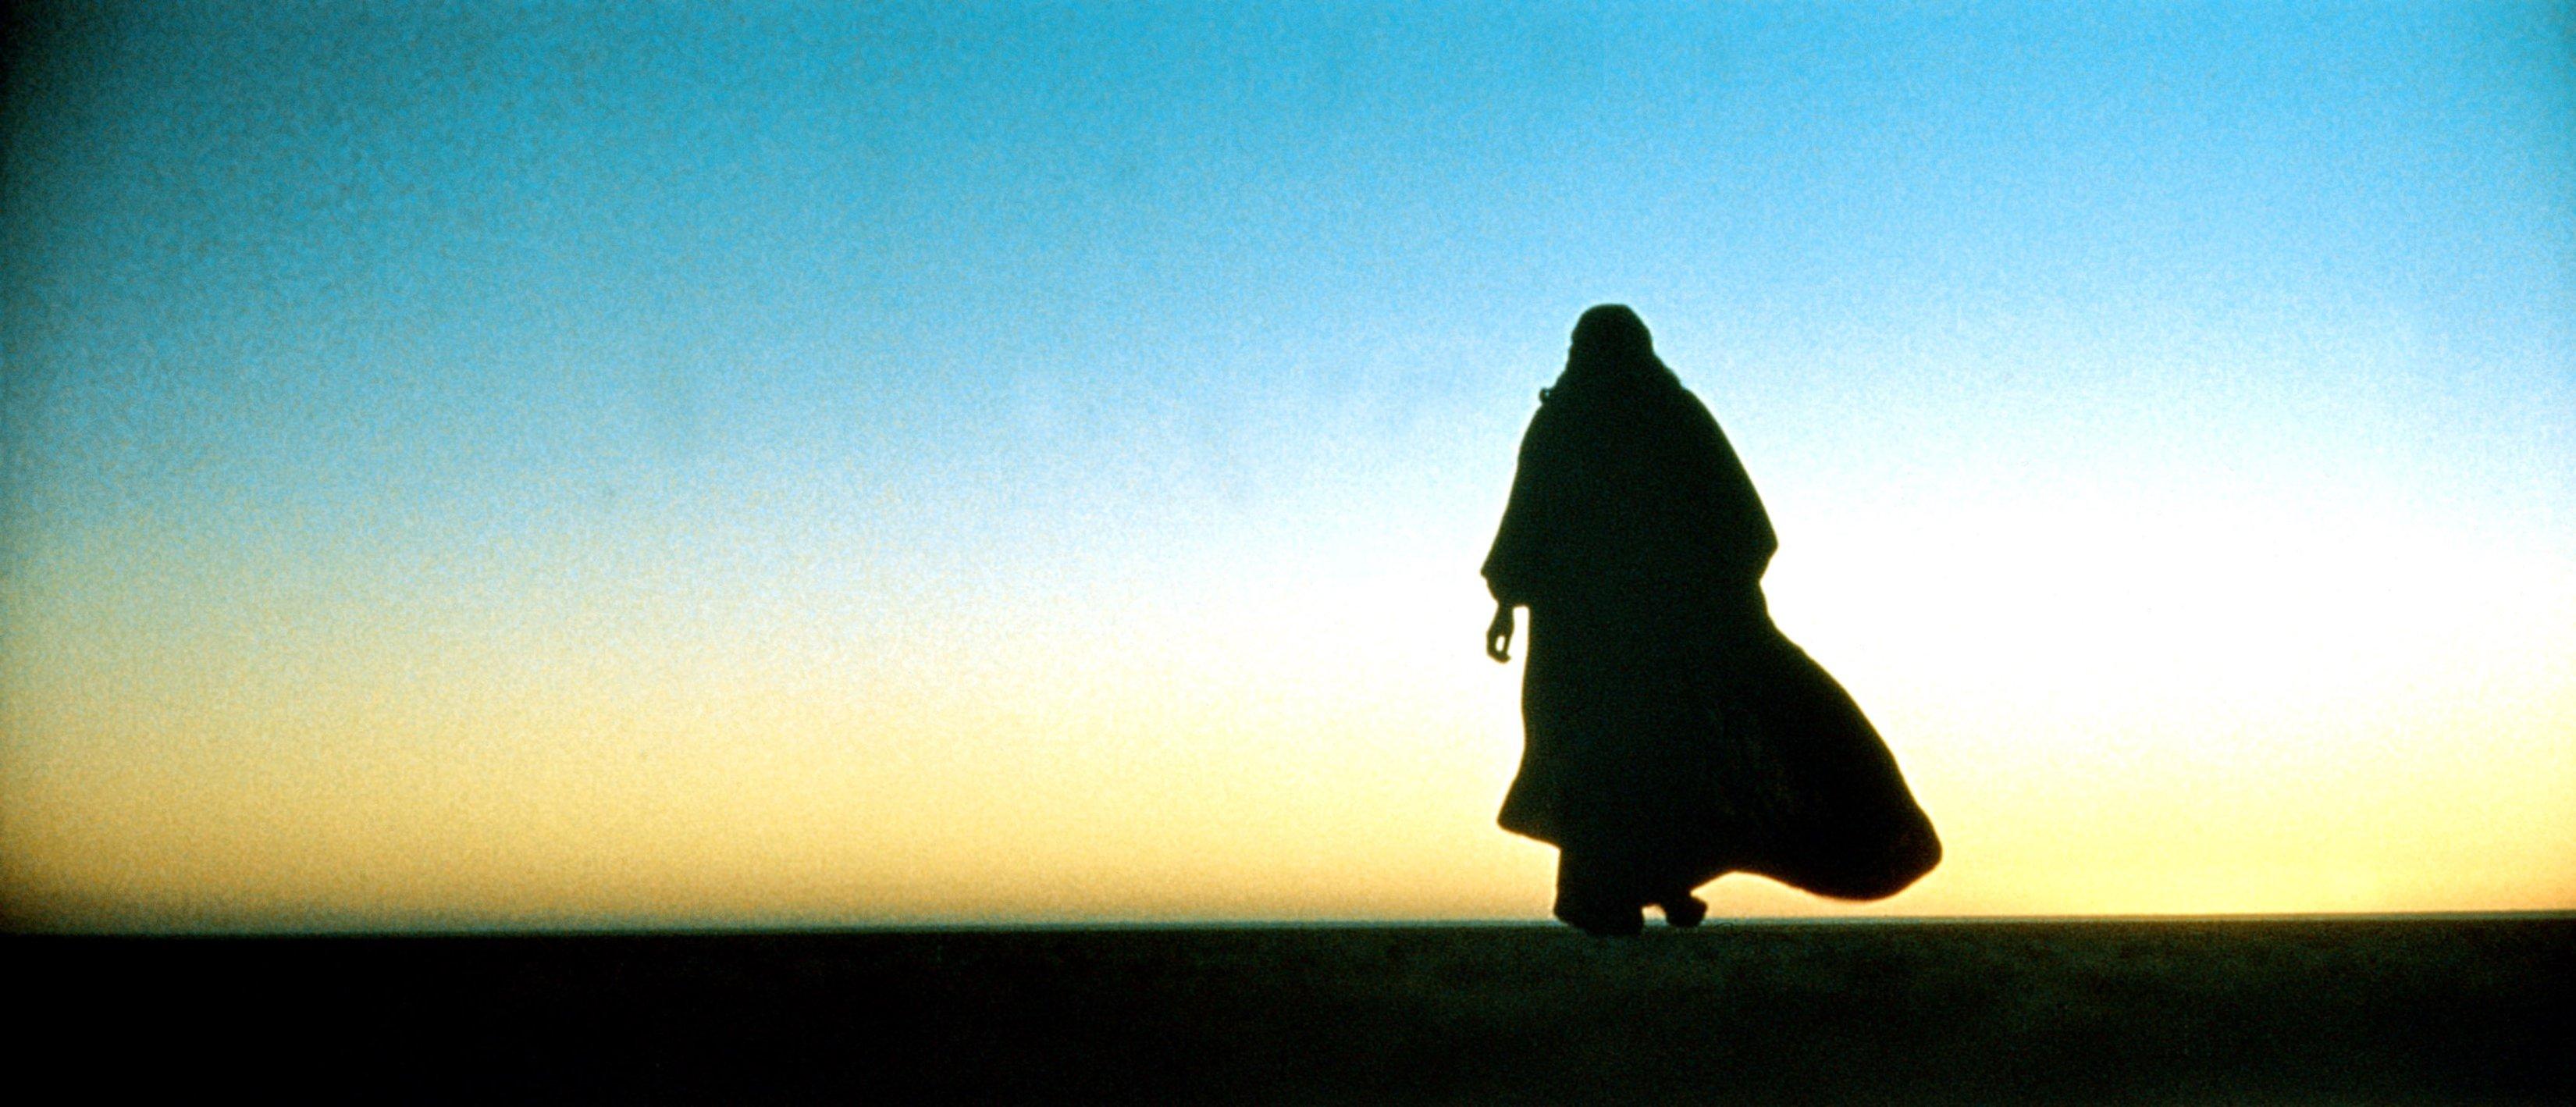 Лоуренс Аравийский Lawrence of Arabia (1962), оператор Фредди Янг (режиссер Дэвид Лин)